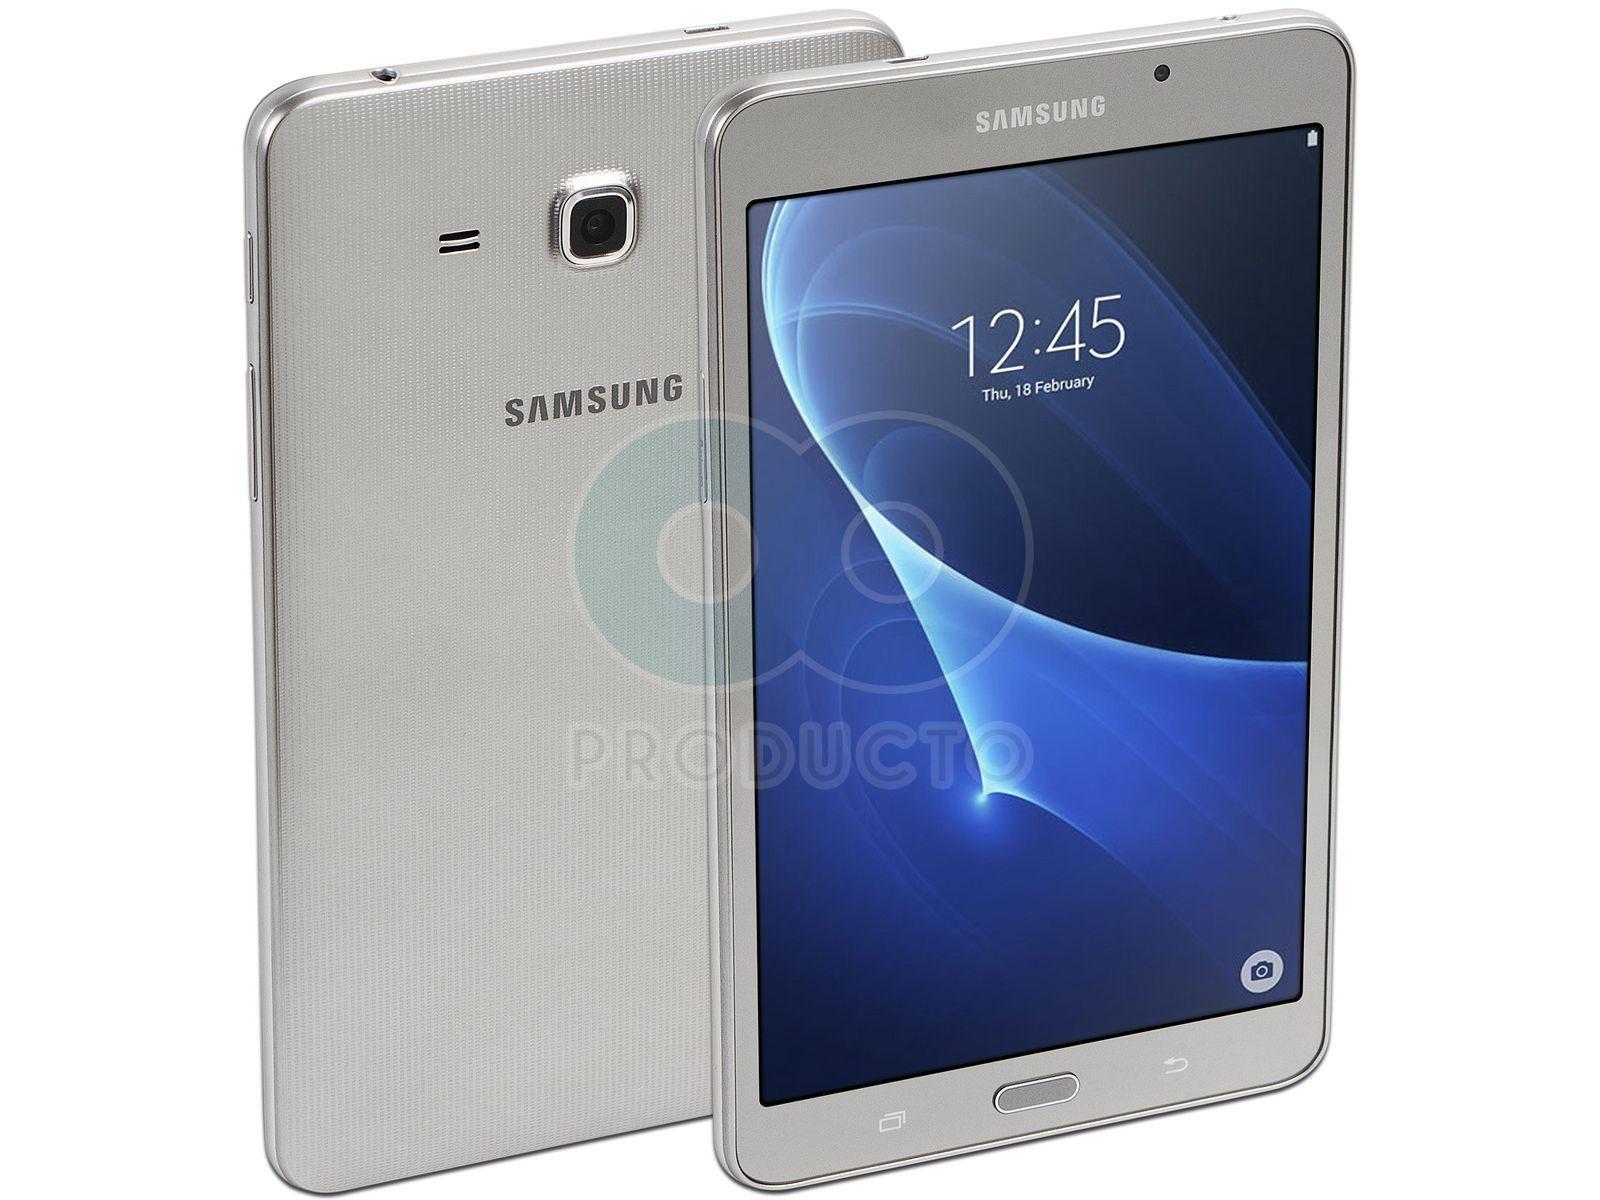 tablet samsung galaxy tab a6 procesador quad core ghz memoria ram de 1 5gb. Black Bedroom Furniture Sets. Home Design Ideas